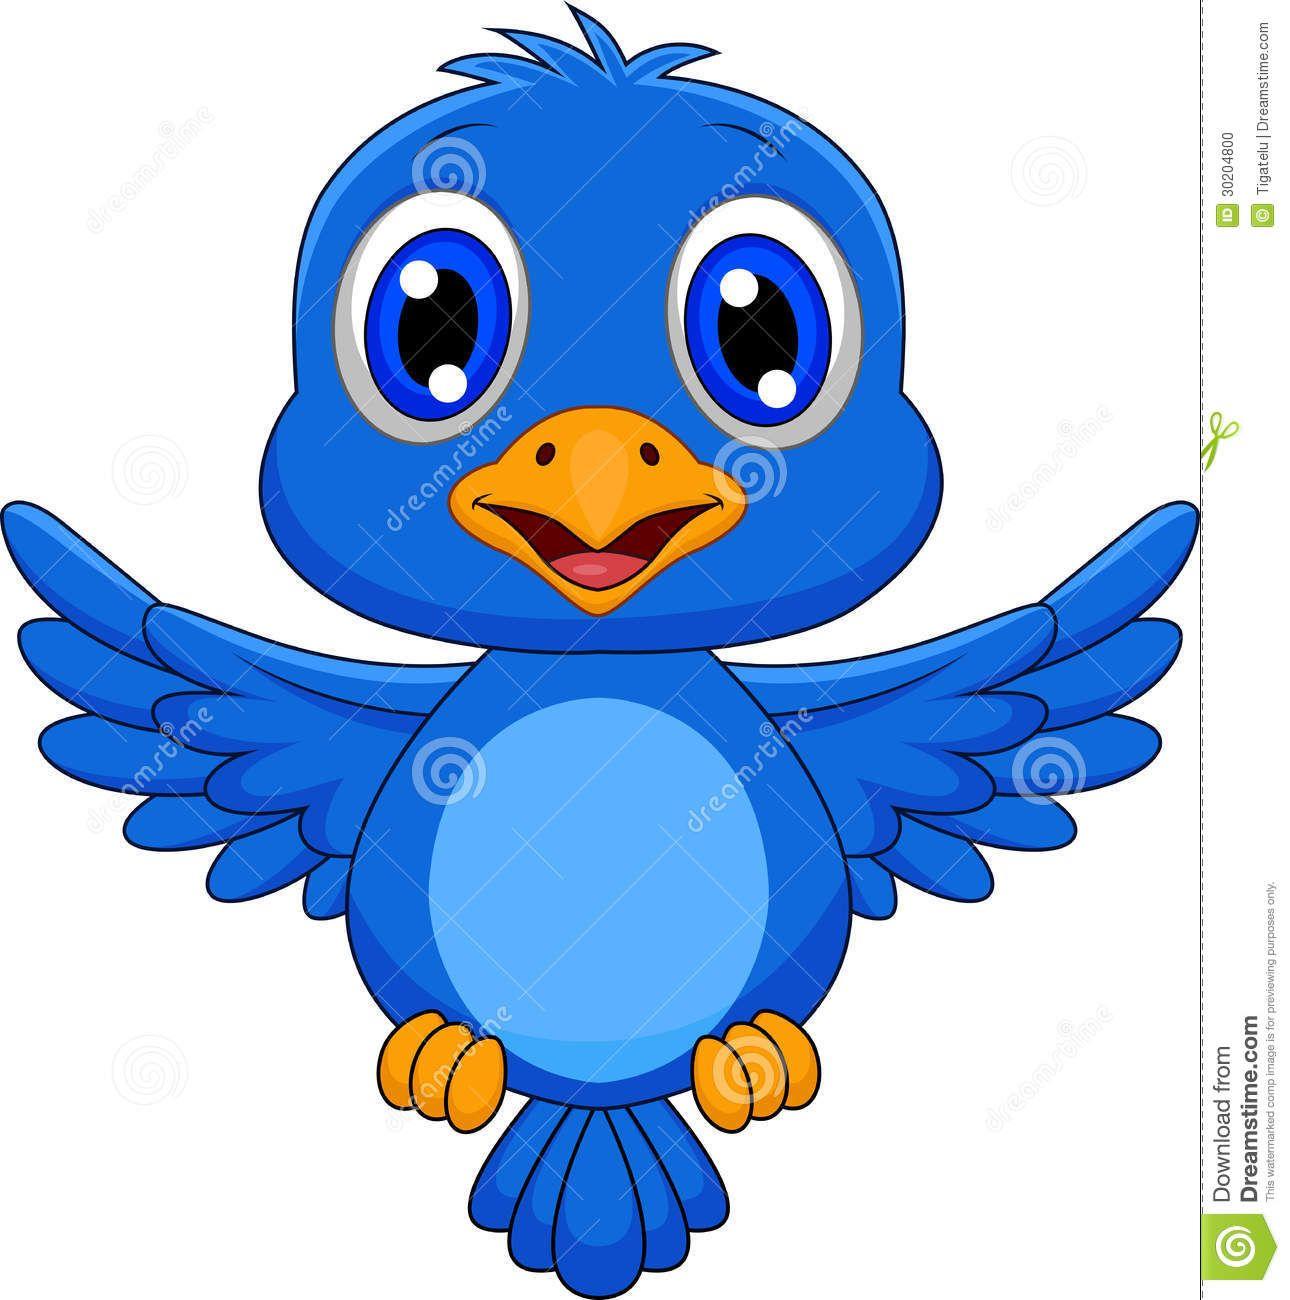 Bluebird Flying Feeding Baby Bird Stock Photo - Image: 55386110